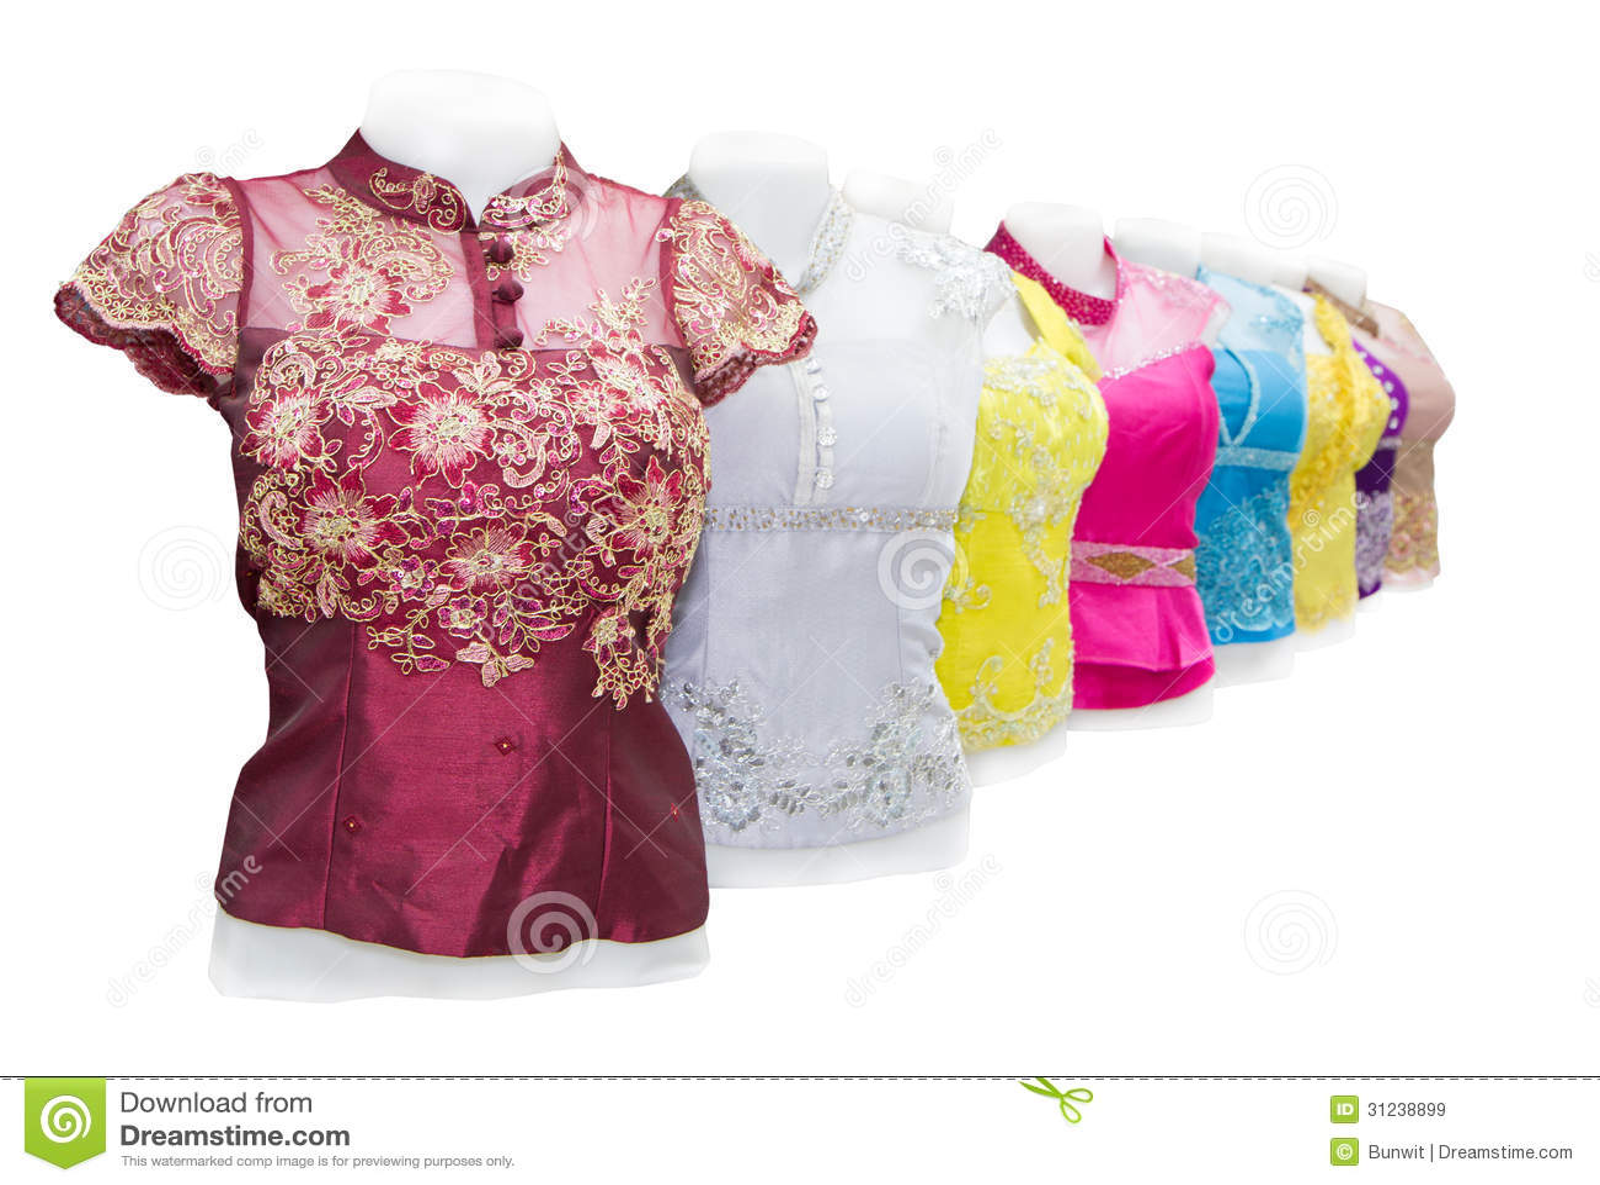 Laos Silk Cloth Handmade Product Stock Image Image Of Vientiane